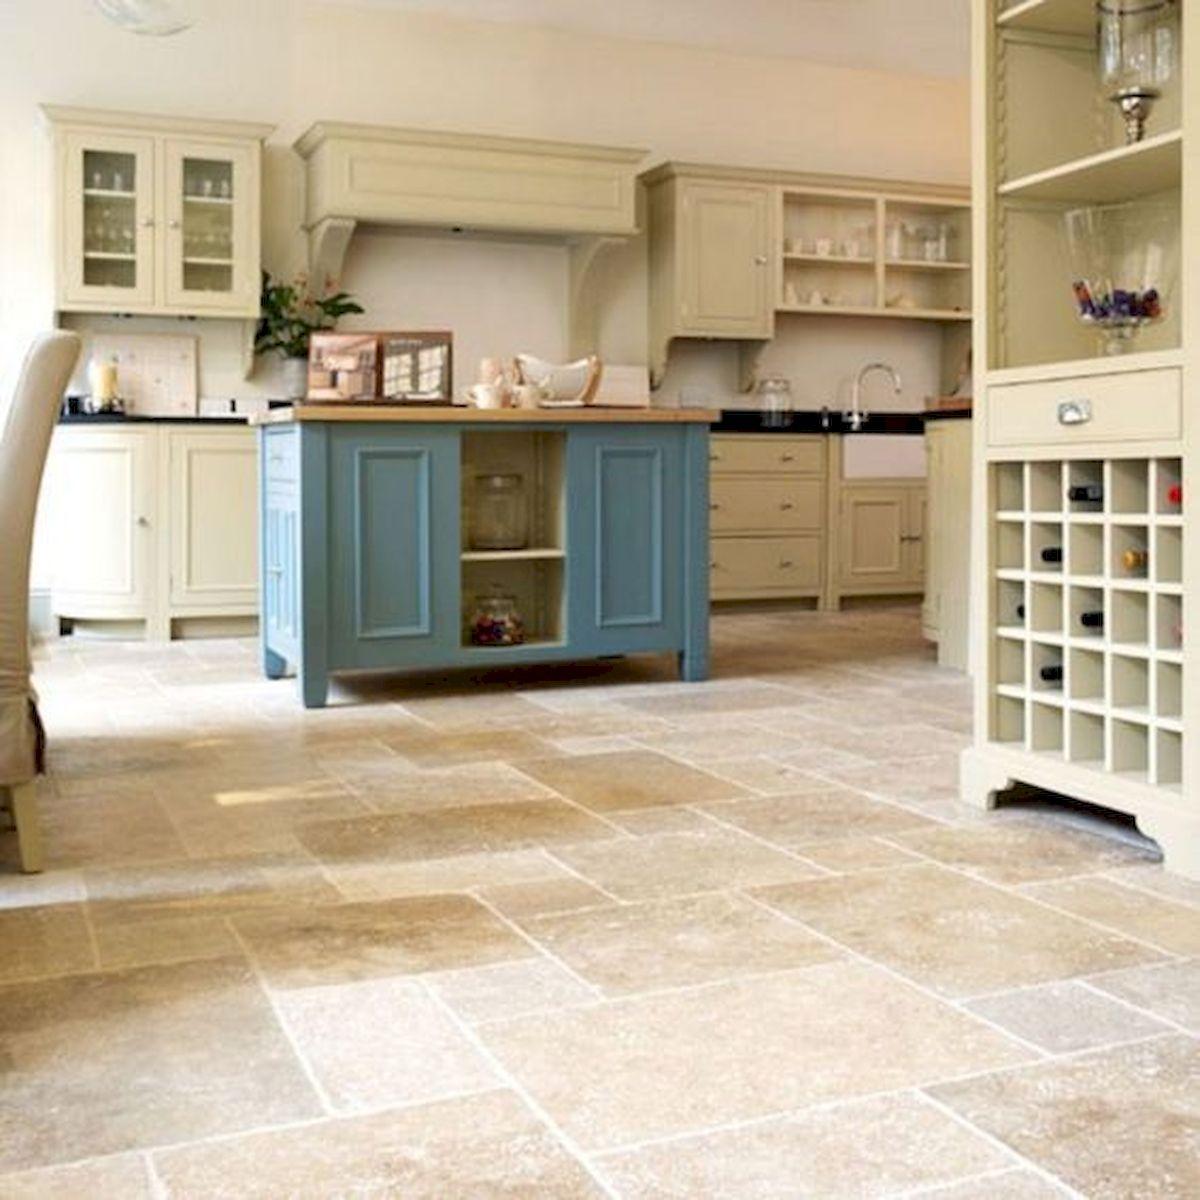 30 Best Kitchen Floor Tile Design Ideas With Concrete Floor Ideas (11)